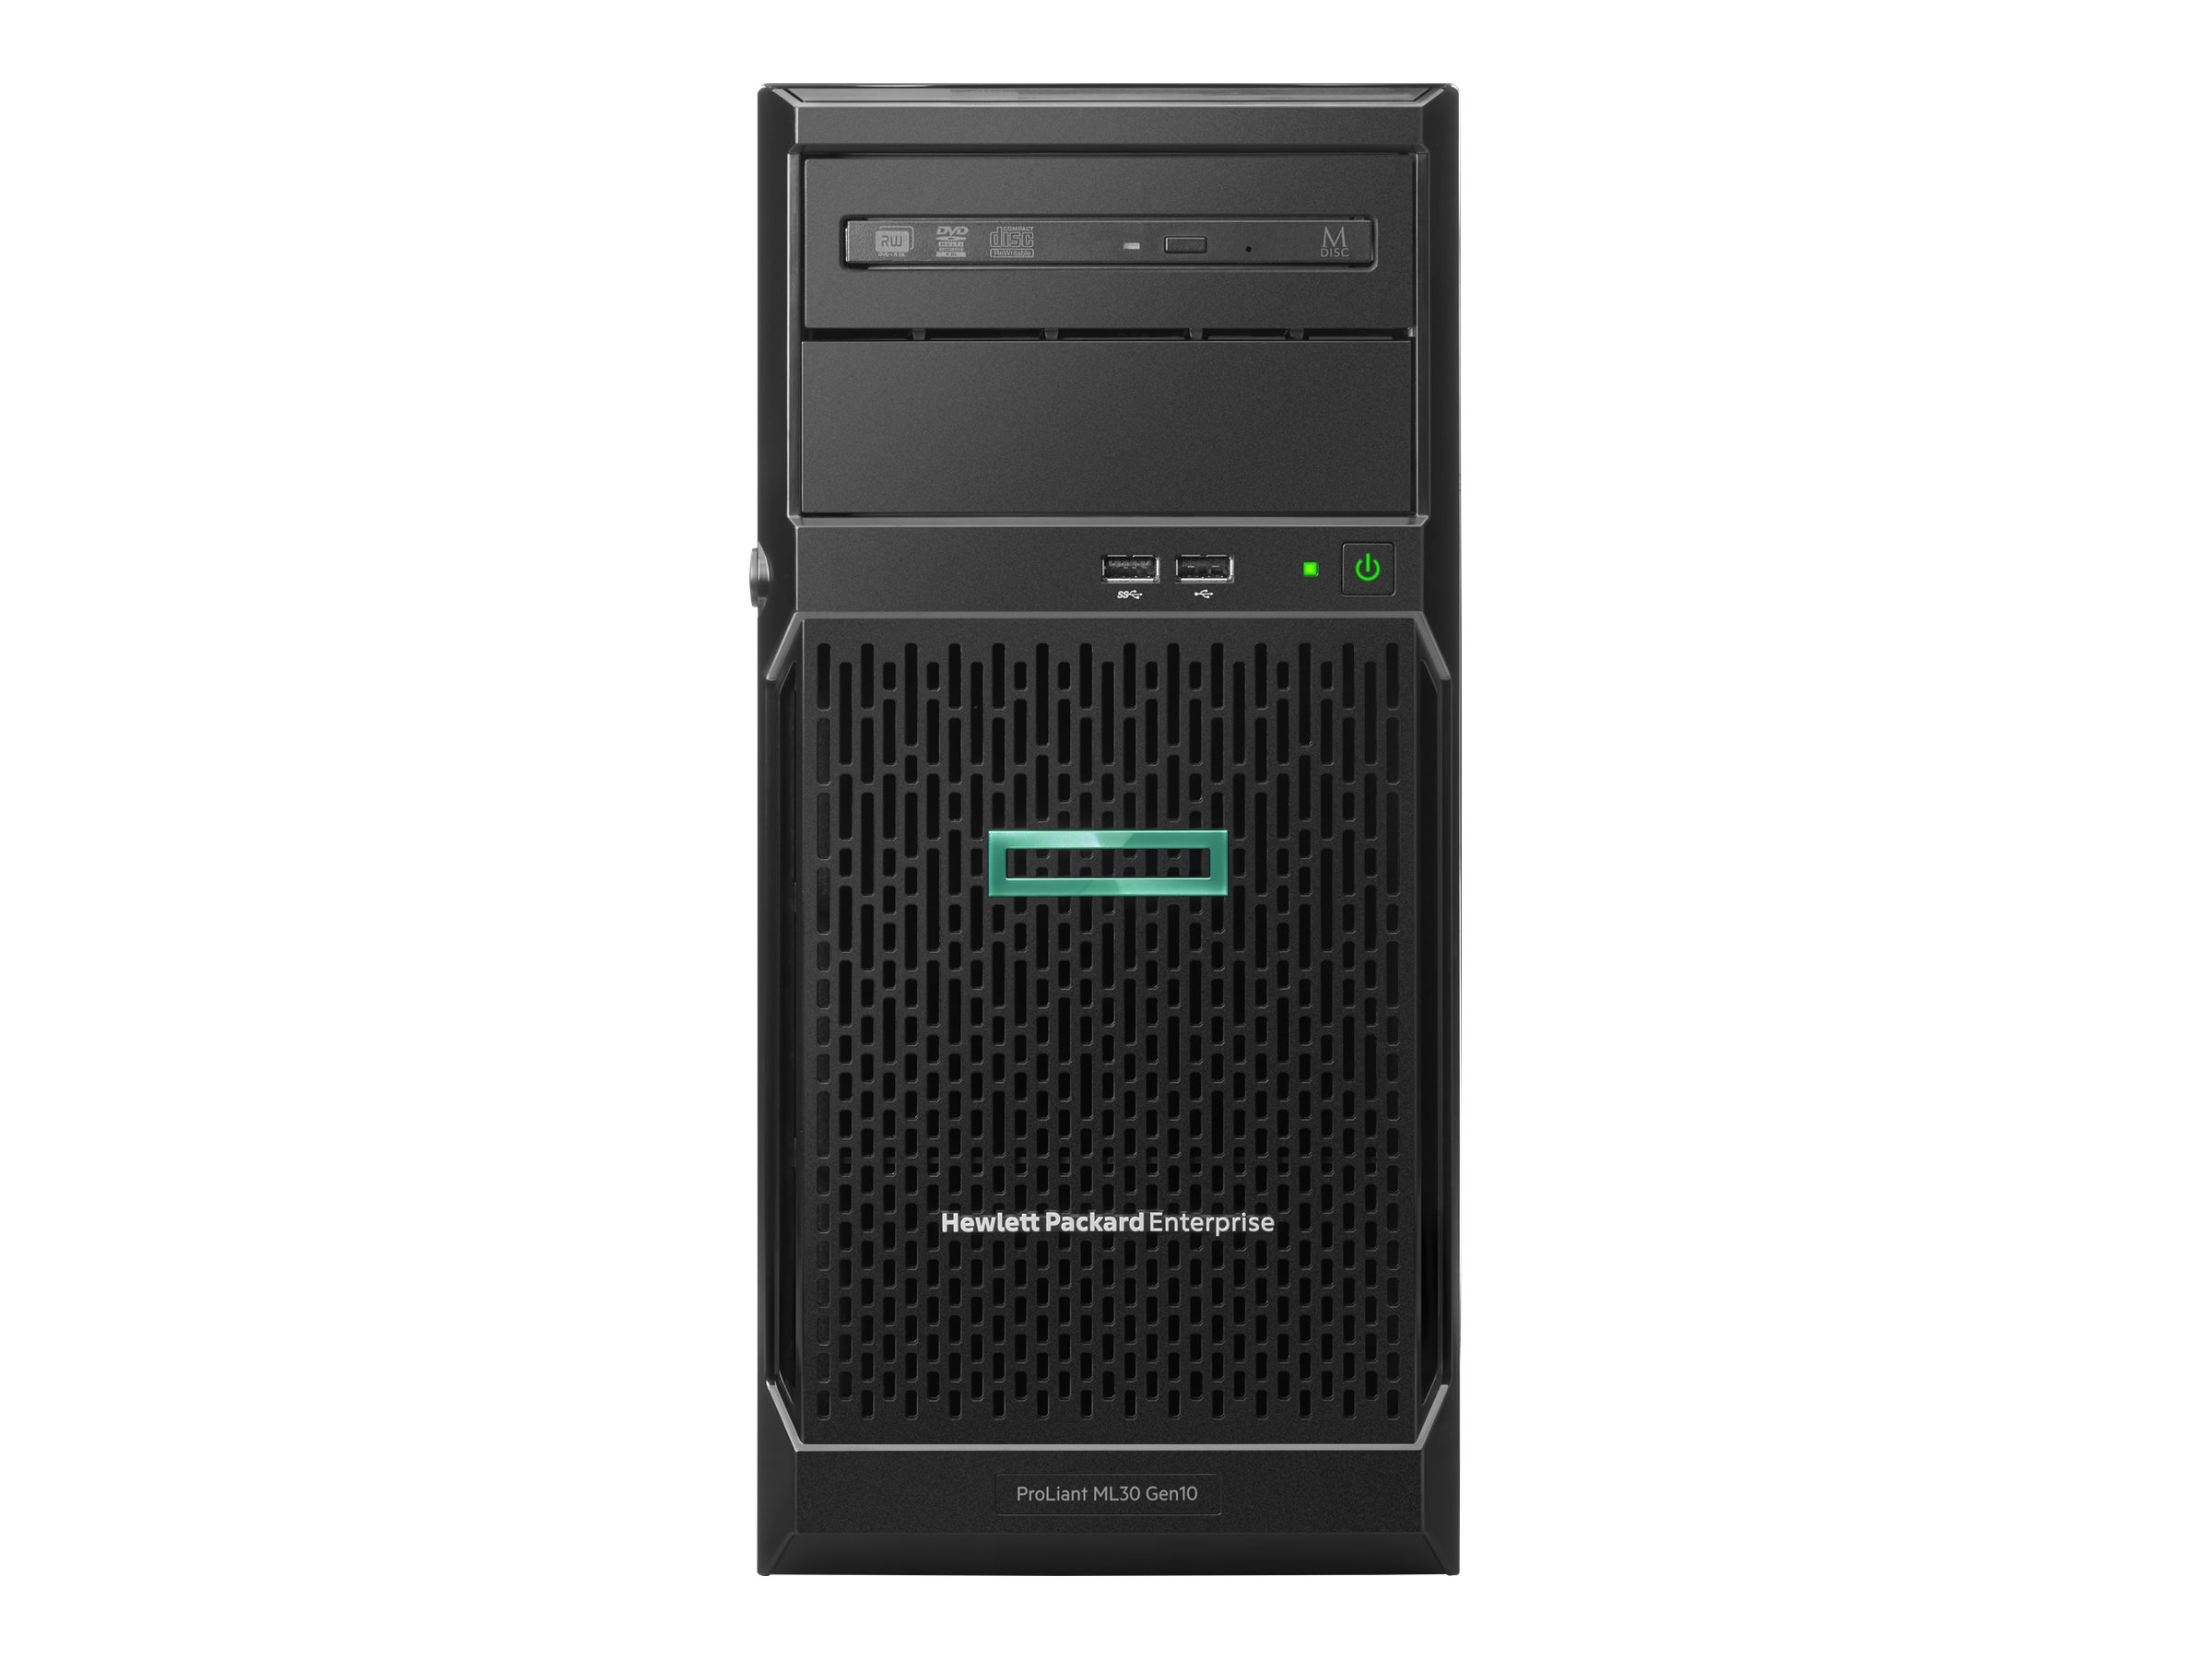 HPE ProLiant ML30 Gen10 Solution - Server - Tower - 4U - 1-Weg - 1 x Xeon E-2134 / 3.5 GHz